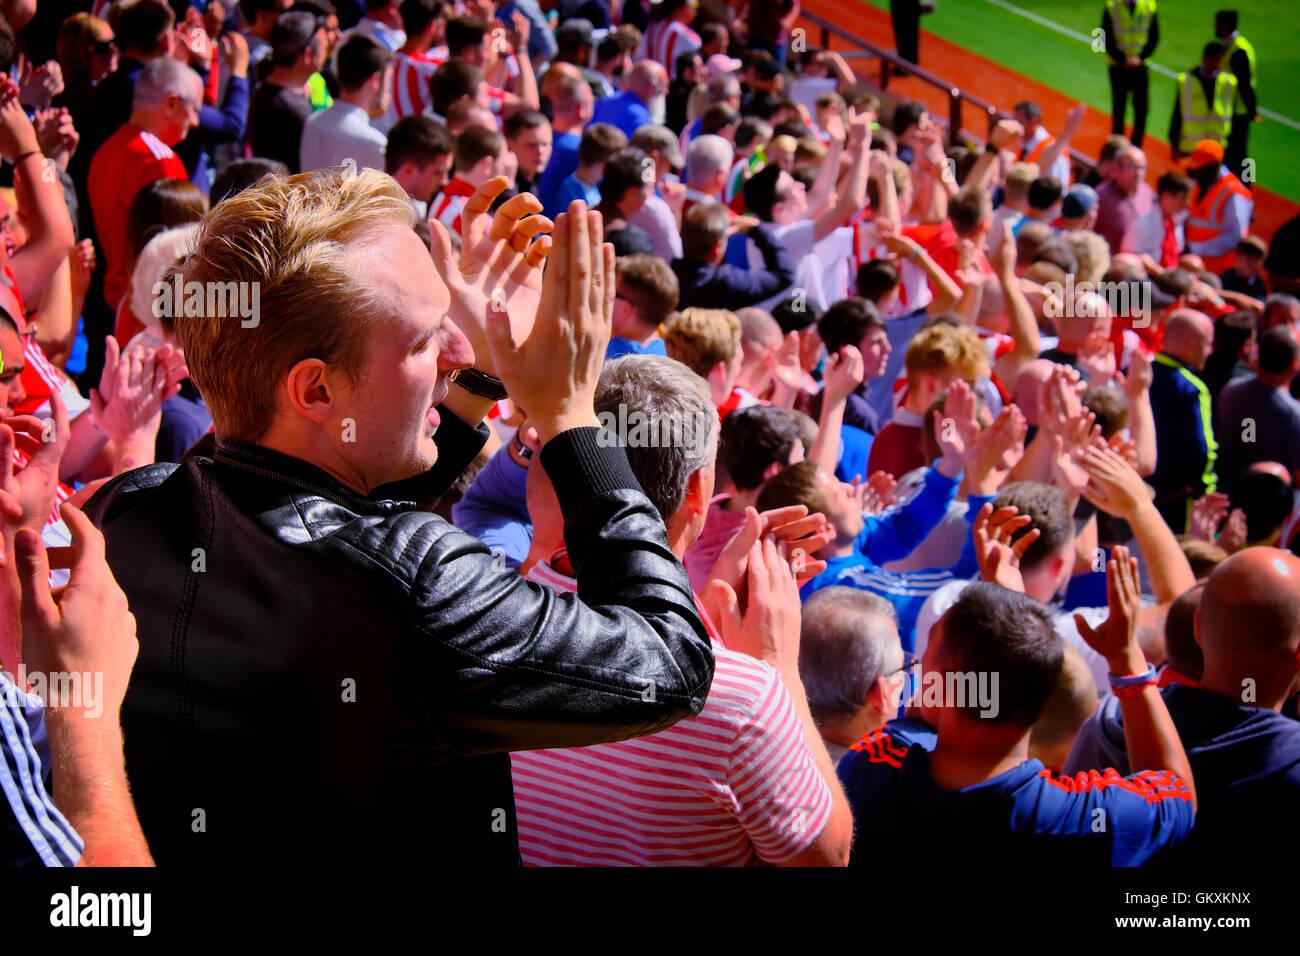 A man applauds his team Sunderland AFC onto the pitch at Aston Villa's Villa Park - Stock Image